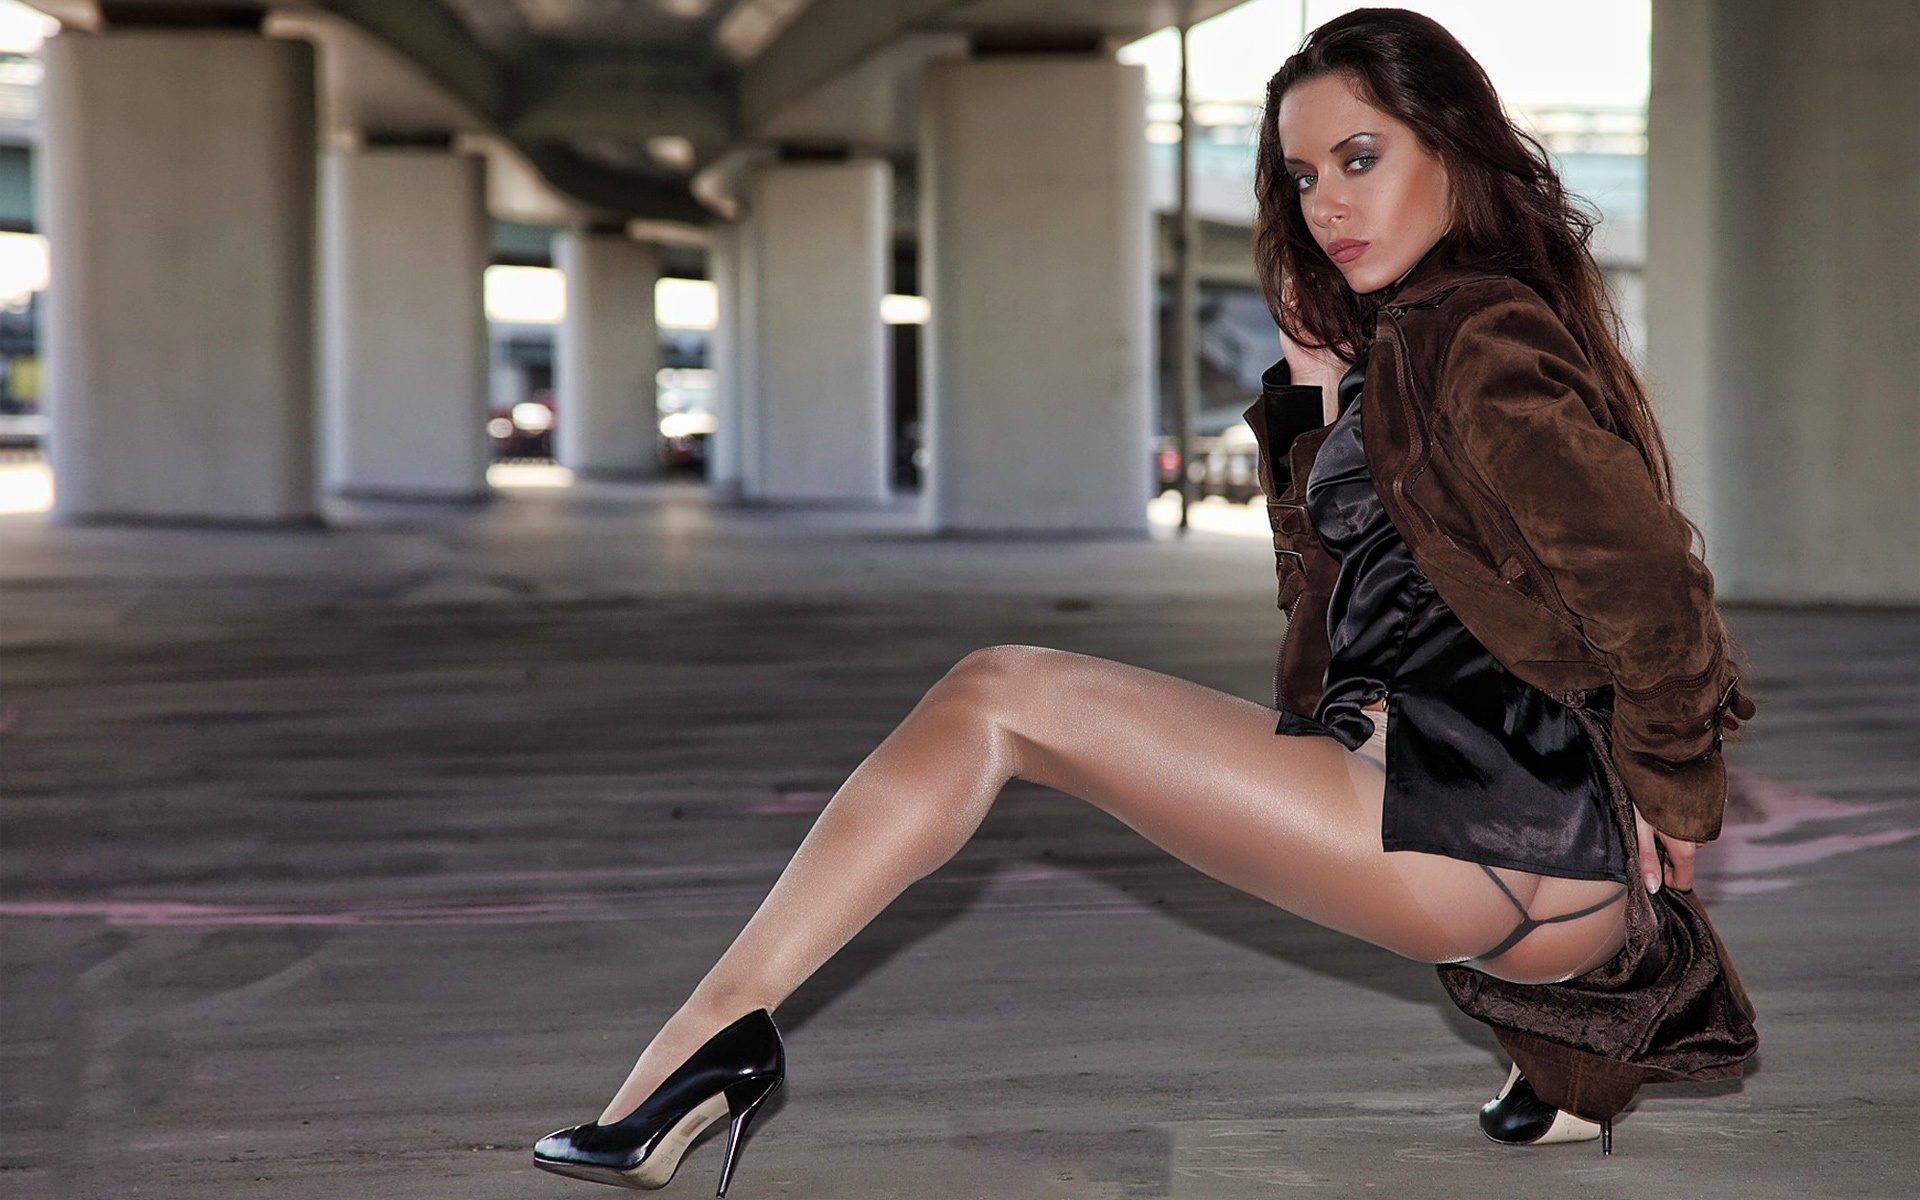 hot legs pics: